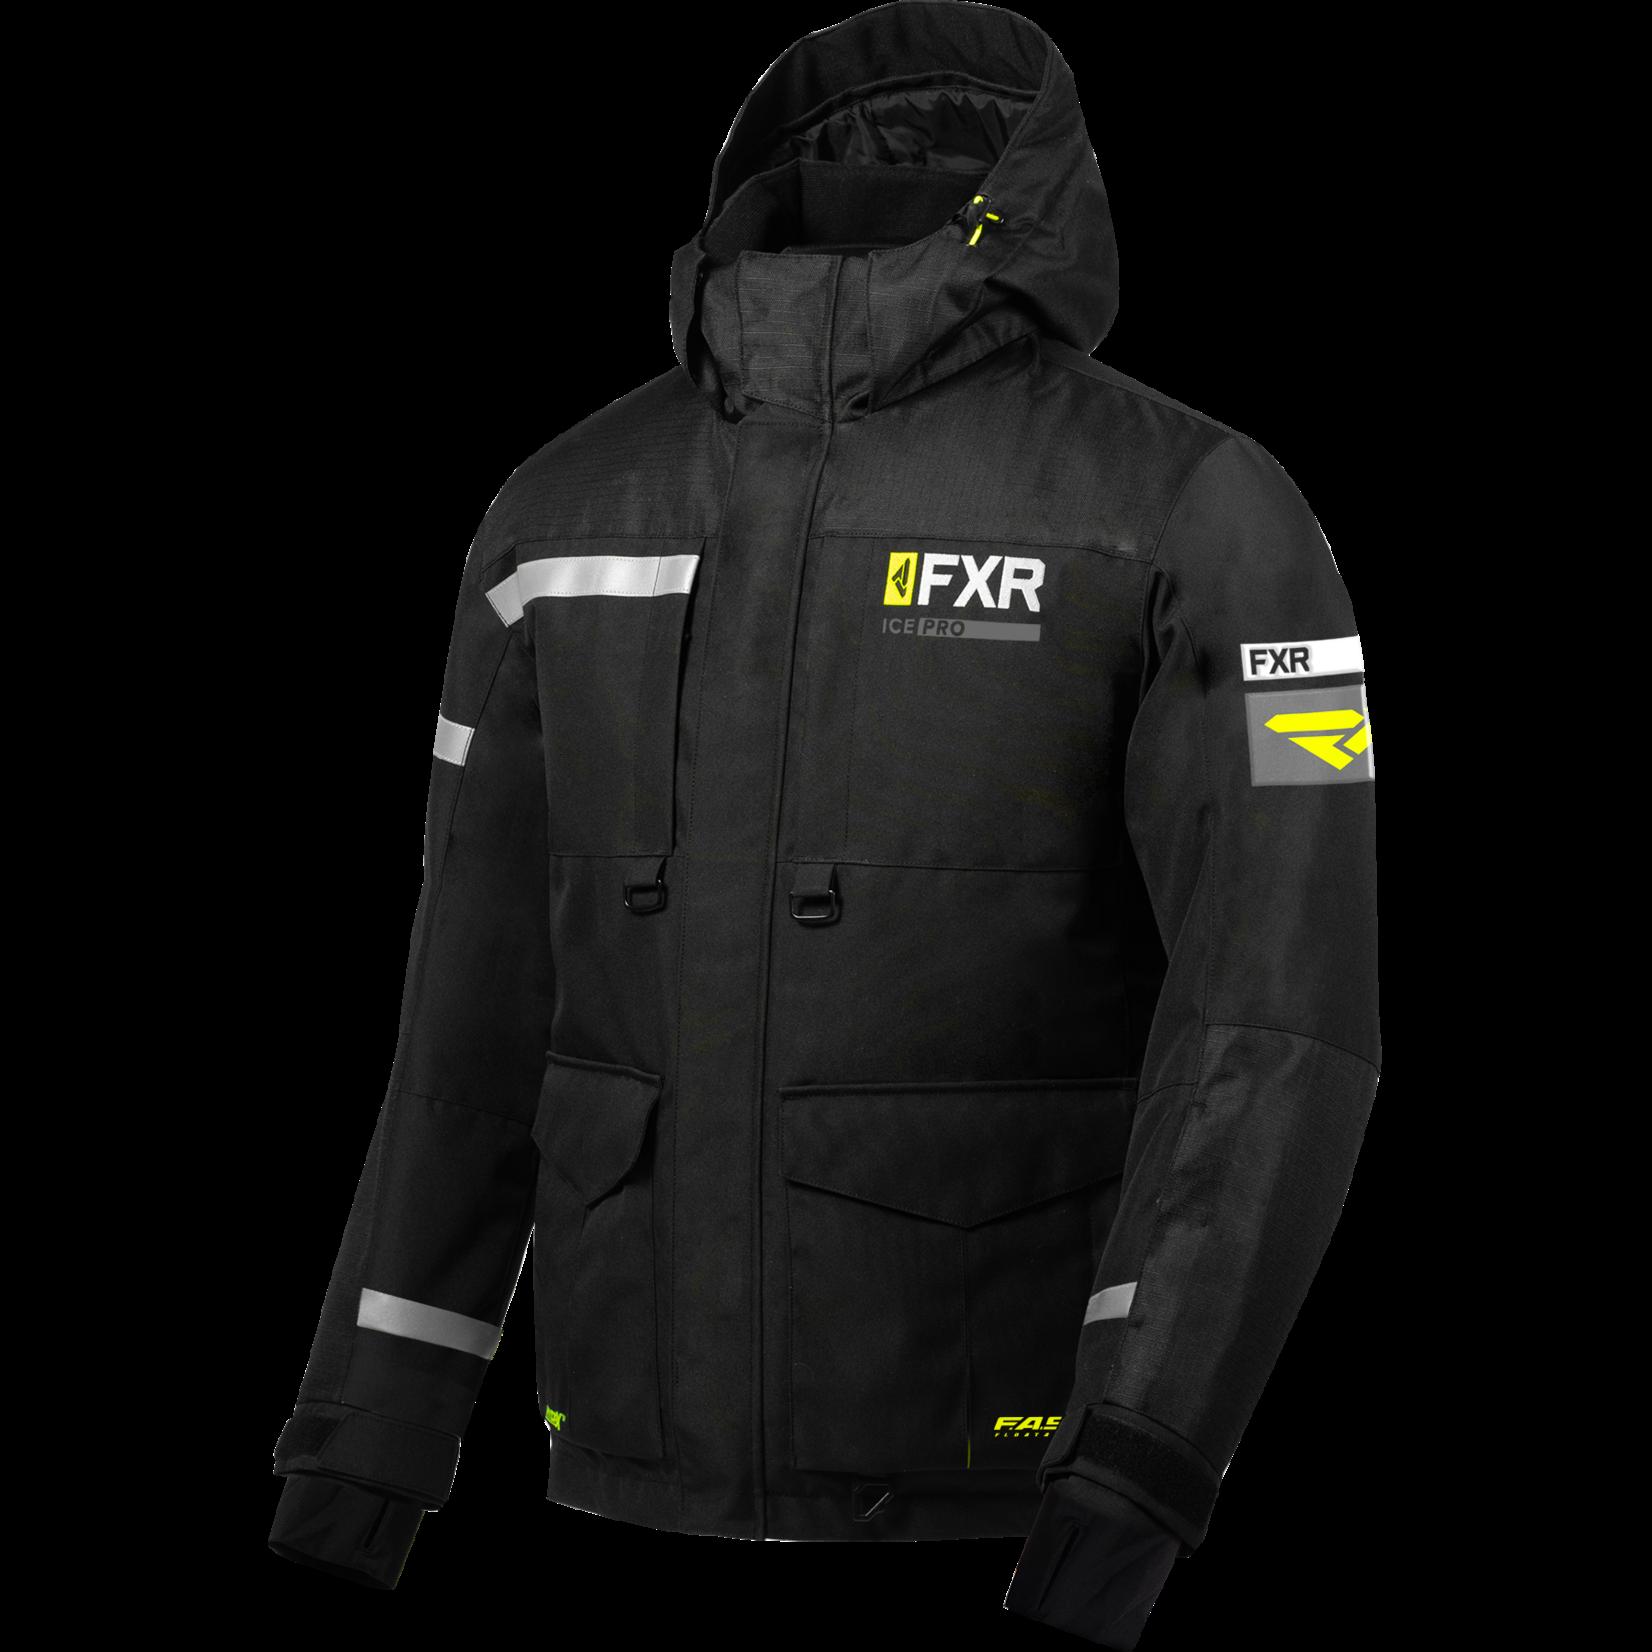 FXR FXR Excursion Ice Pro Jacket